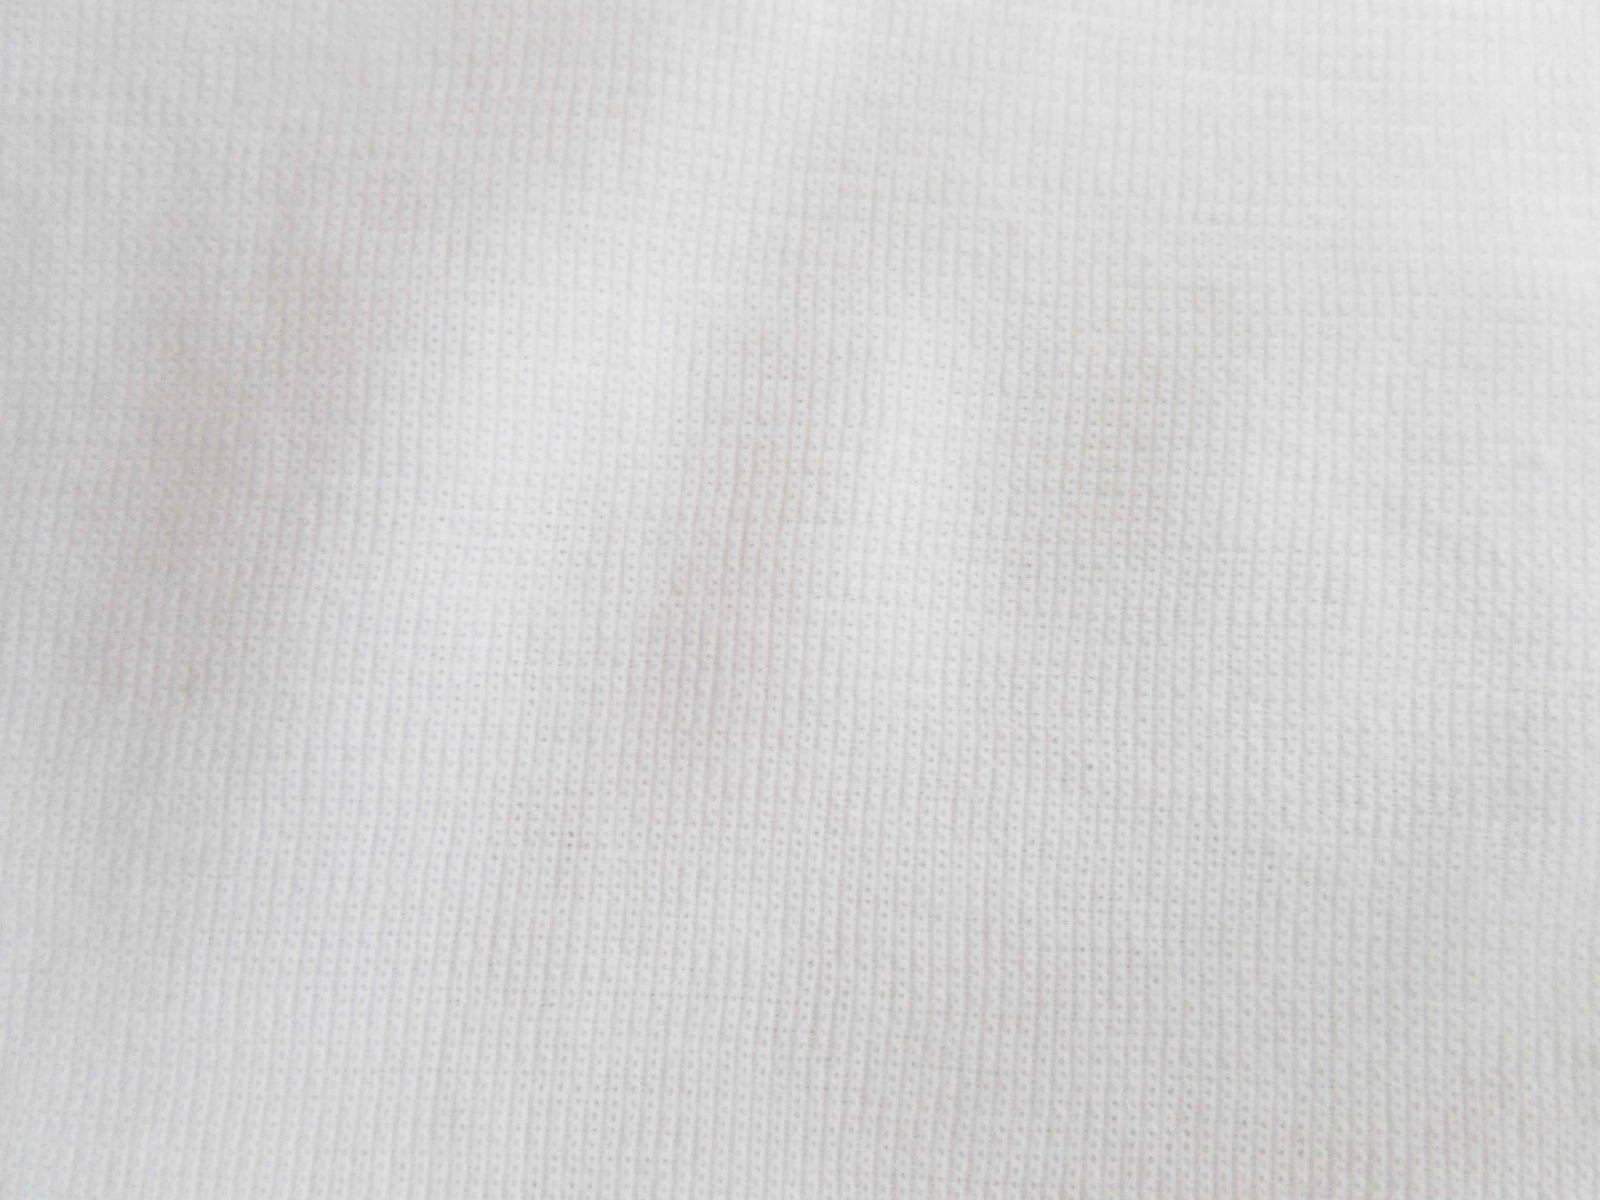 Áo ba lỗ dệt kim đông xuân